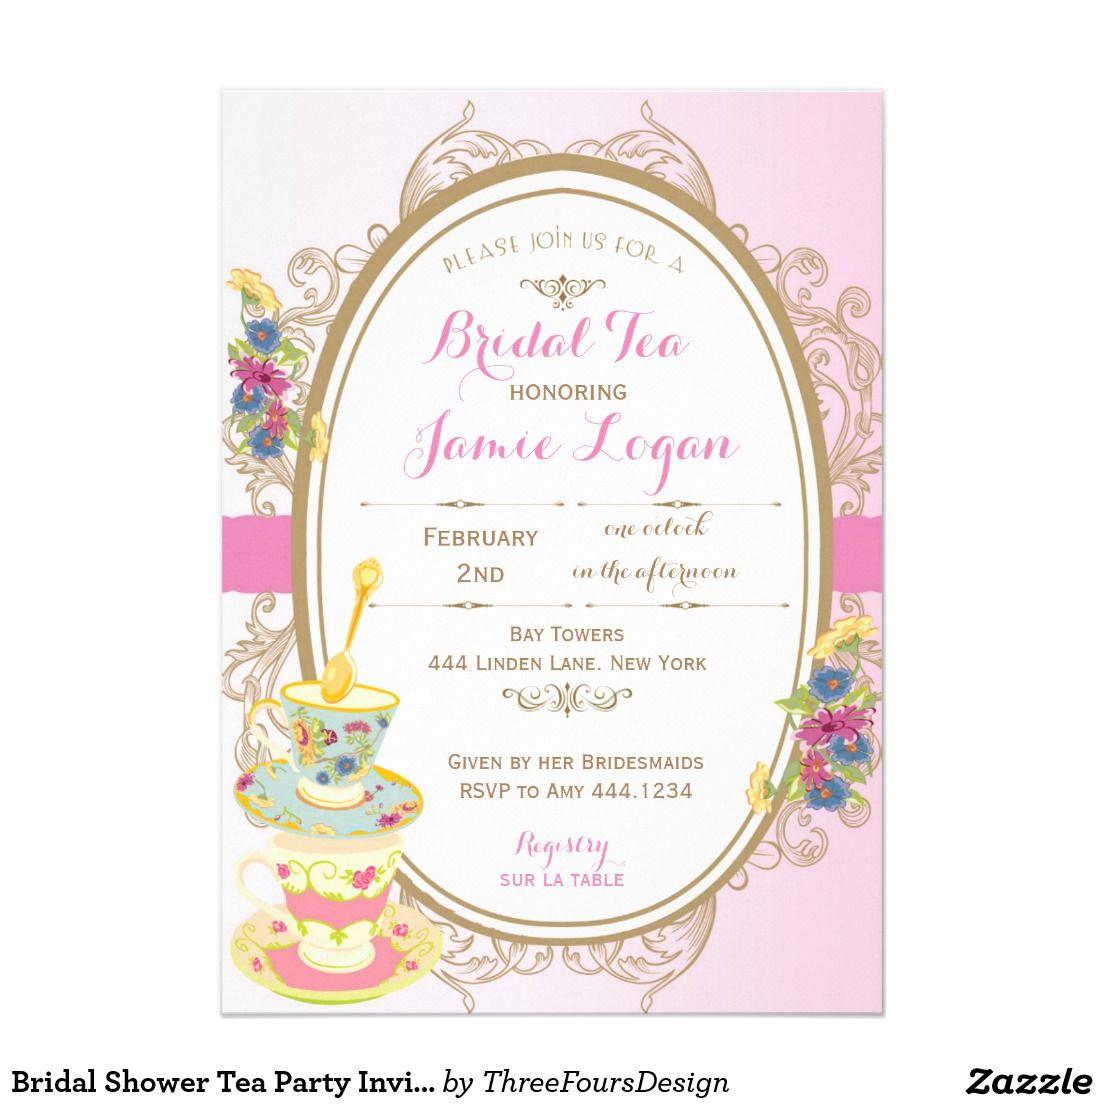 Bridal Shower Tea Party Invitation  Bridal Shower Tea Tea Party